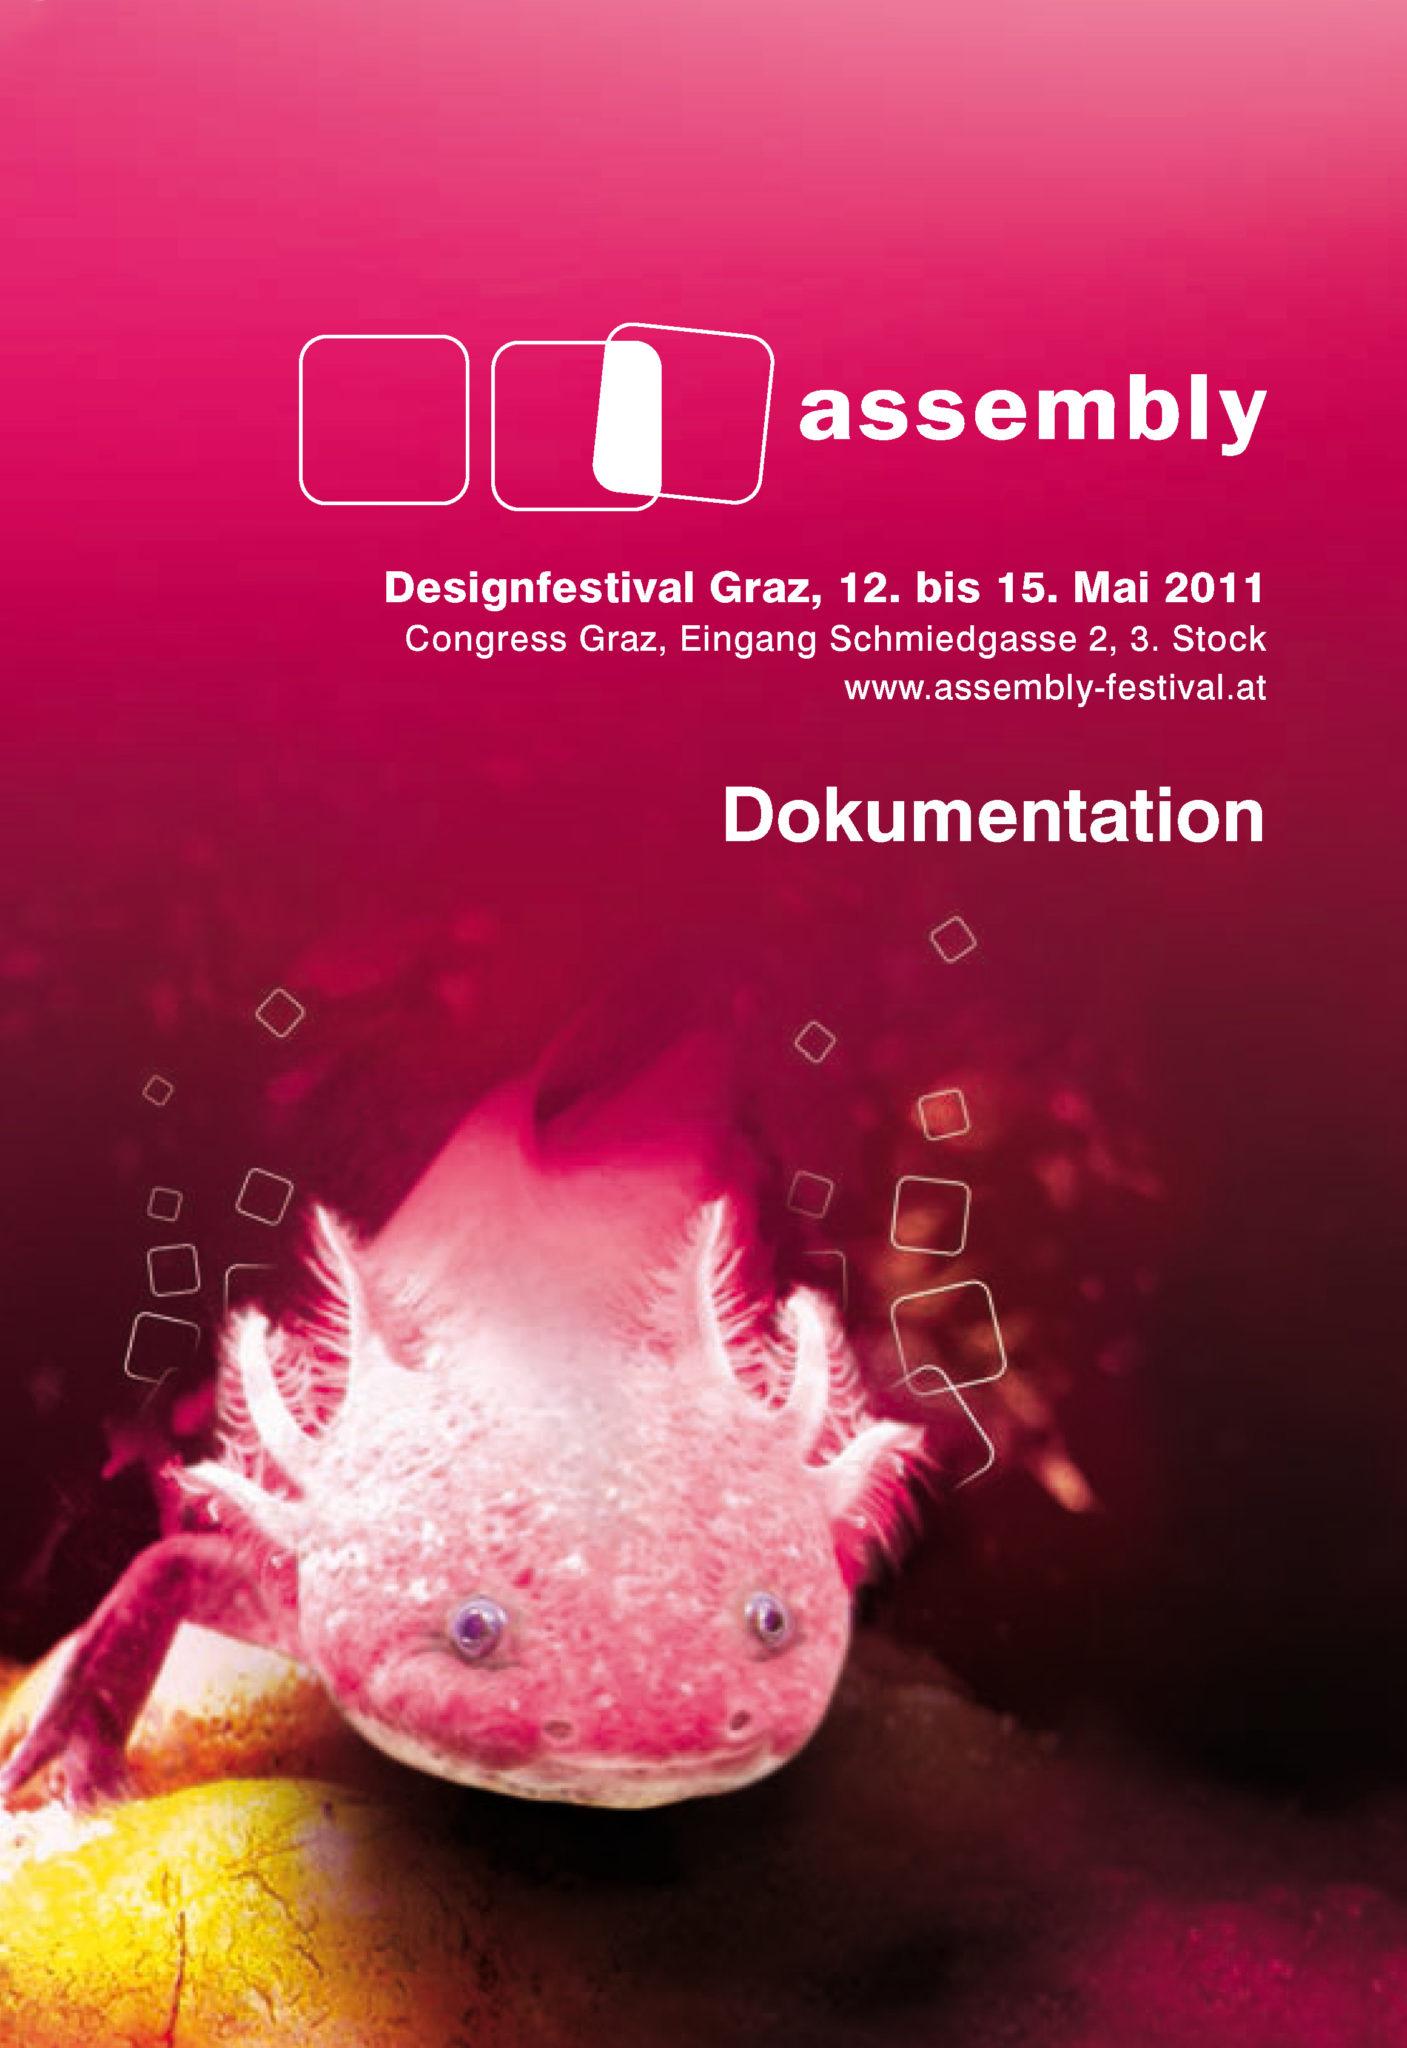 assembly Festival Archive 2011